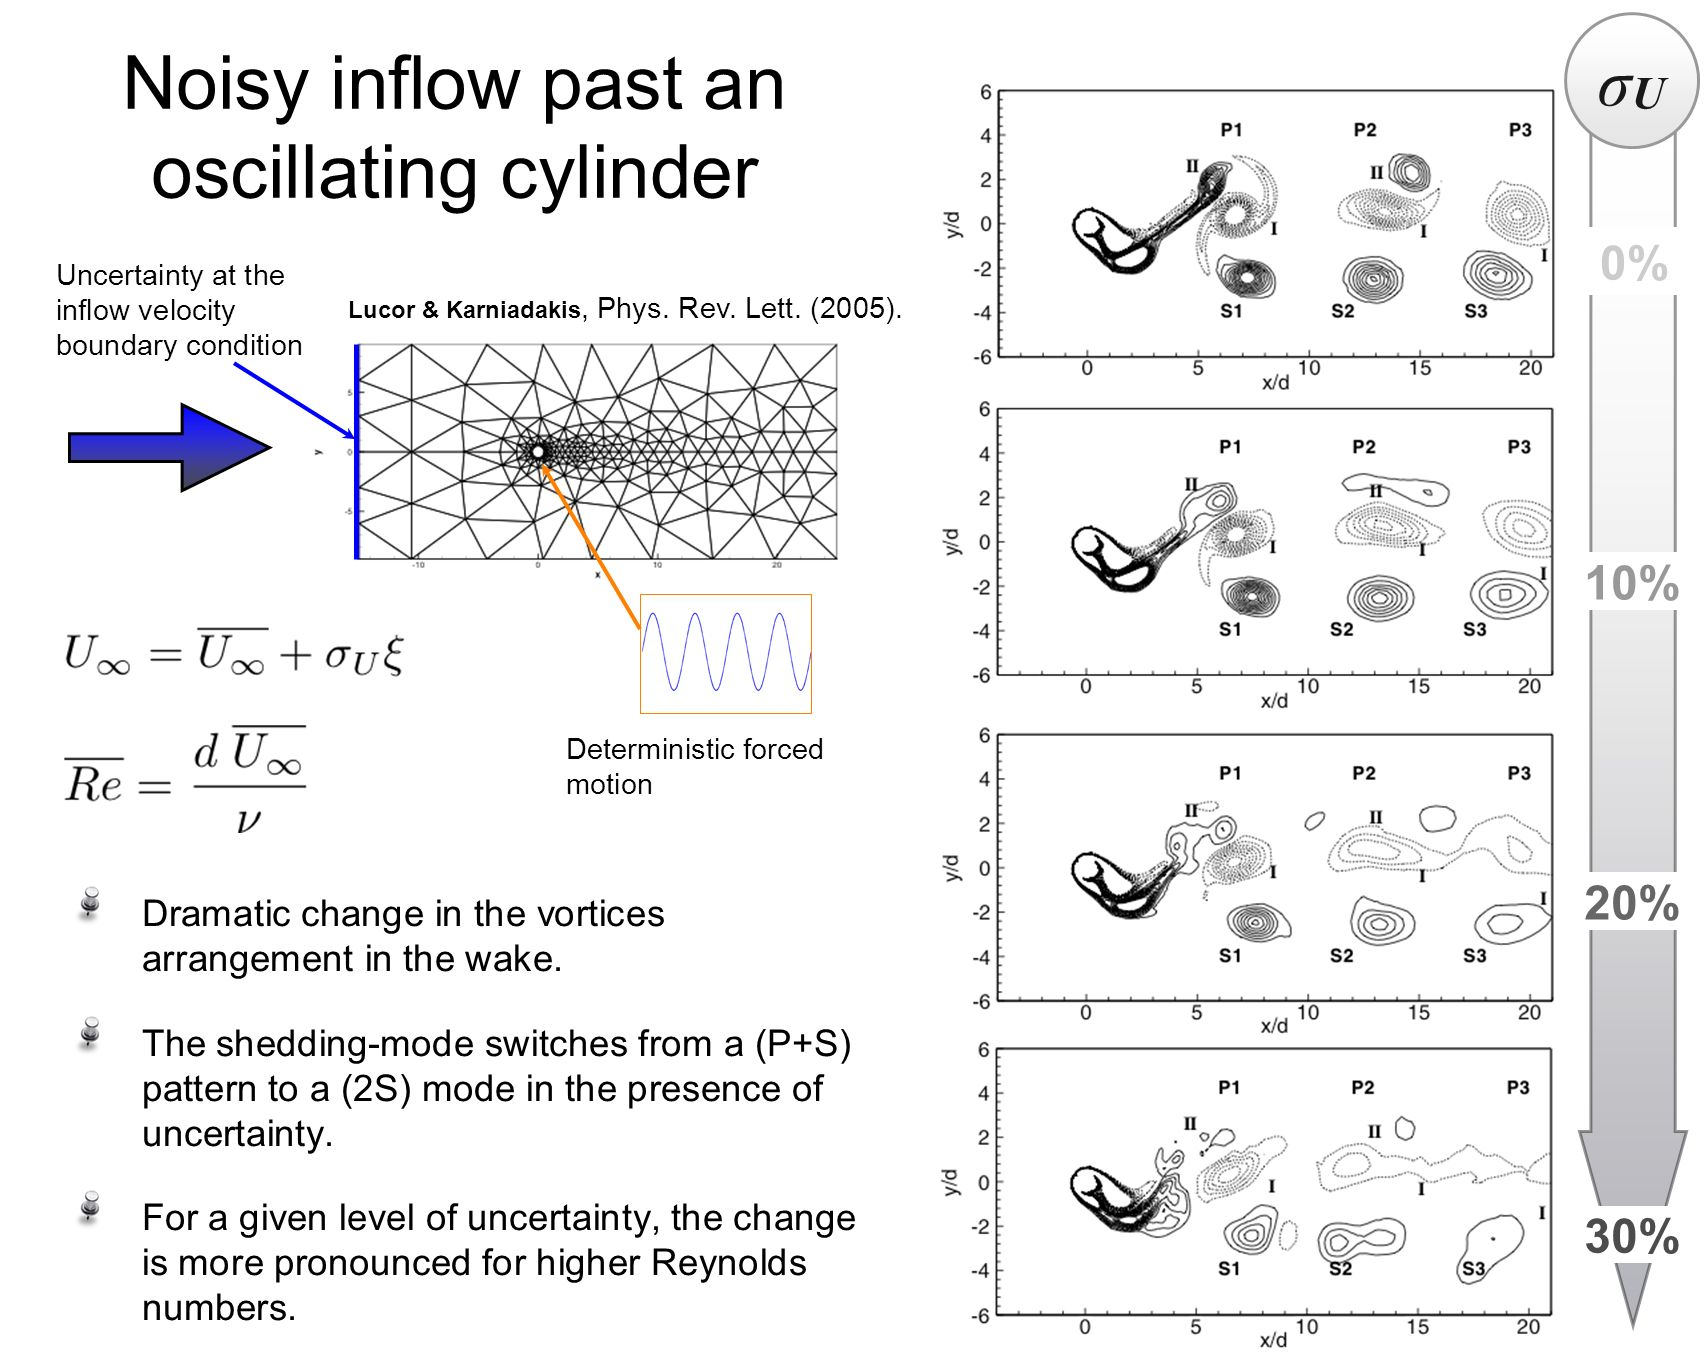 Instantaneous vorticity field RMS values Lucor & Karniadakis, PRL, (2005).